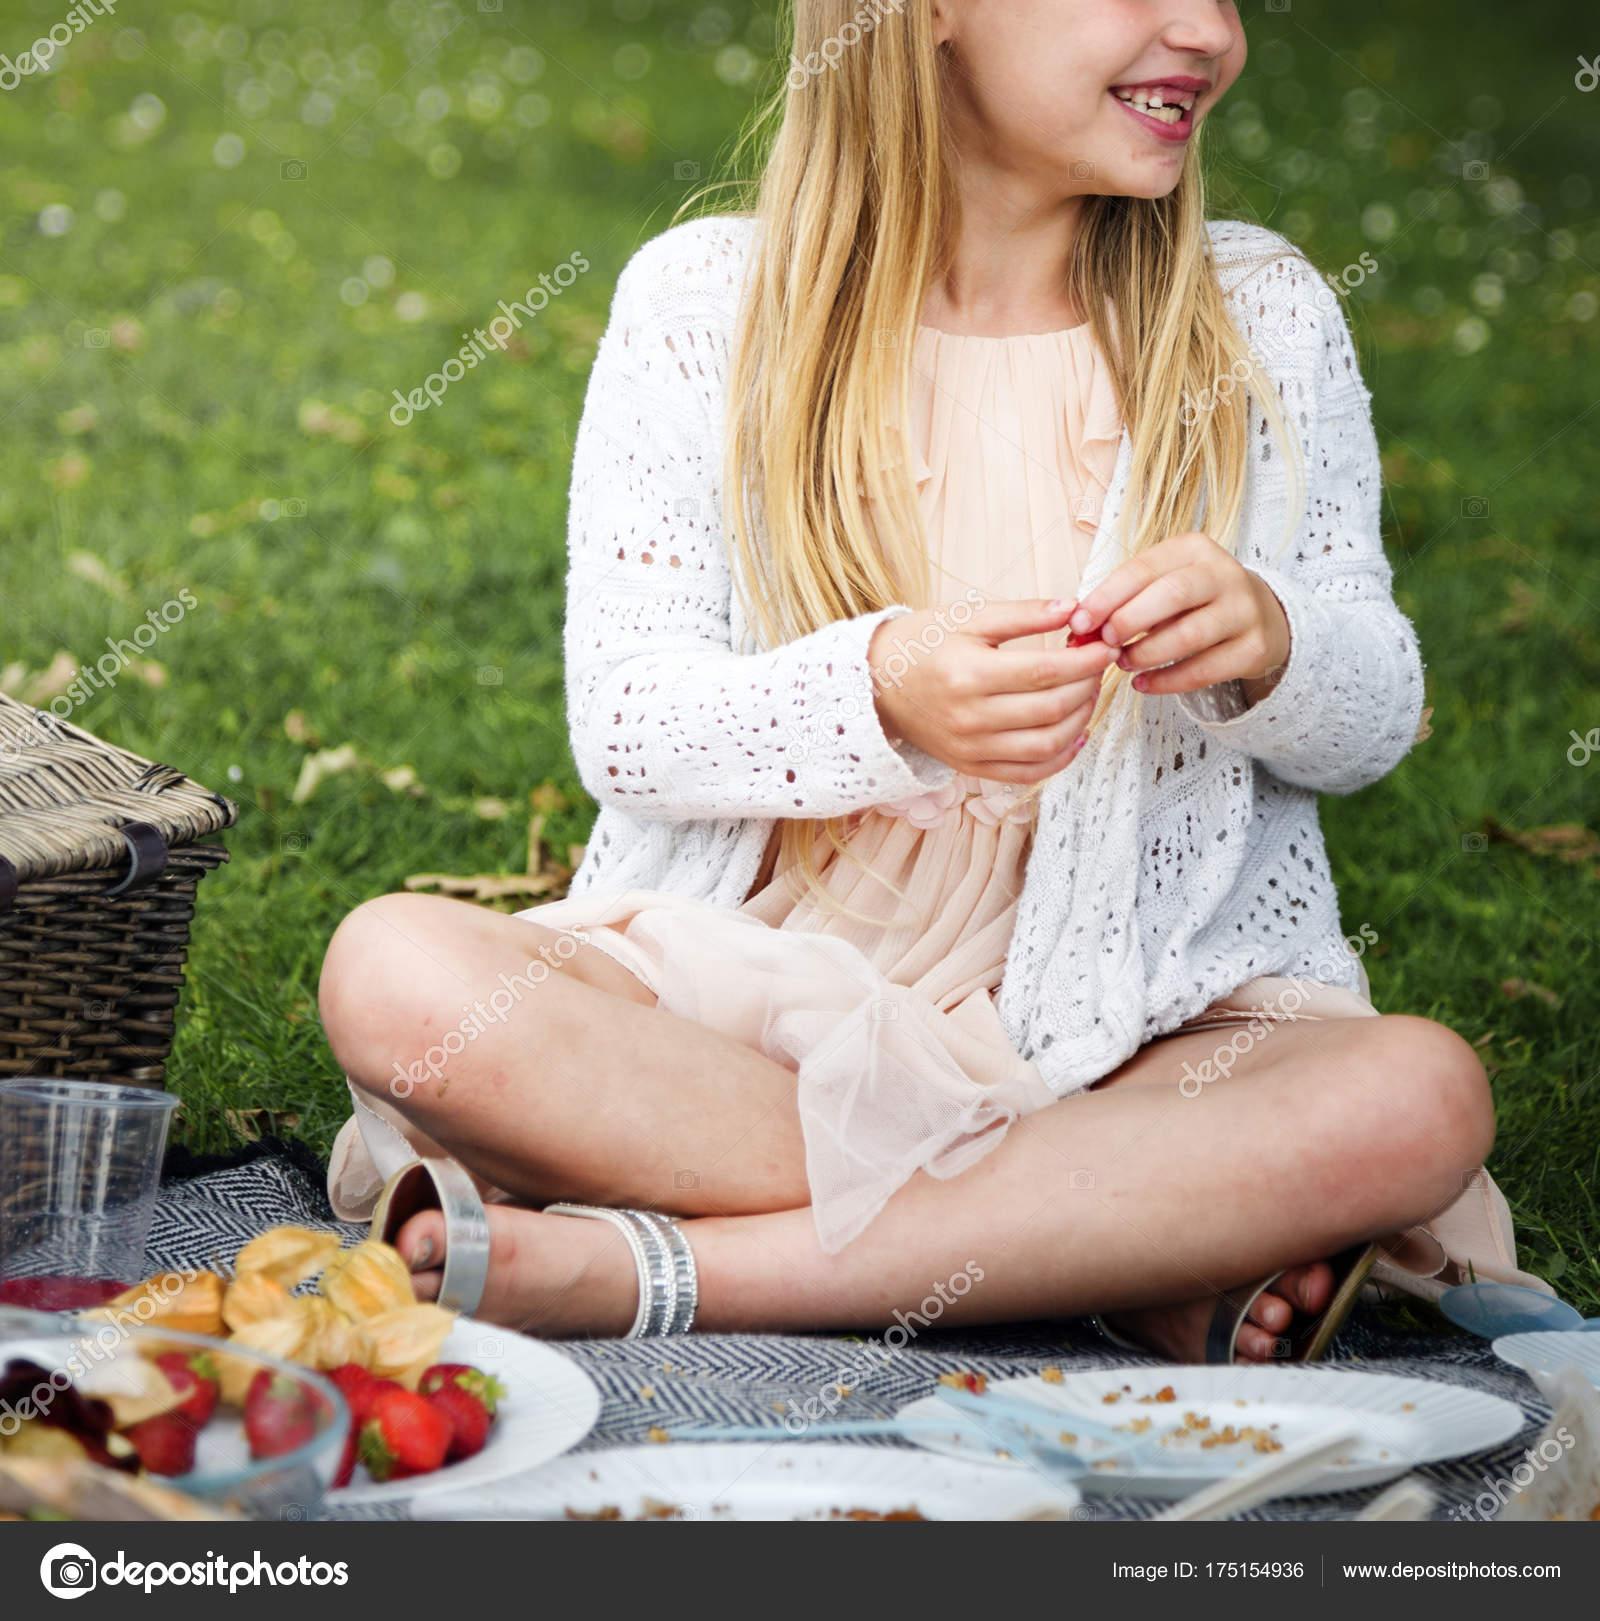 s-blondinkoy-na-piknike